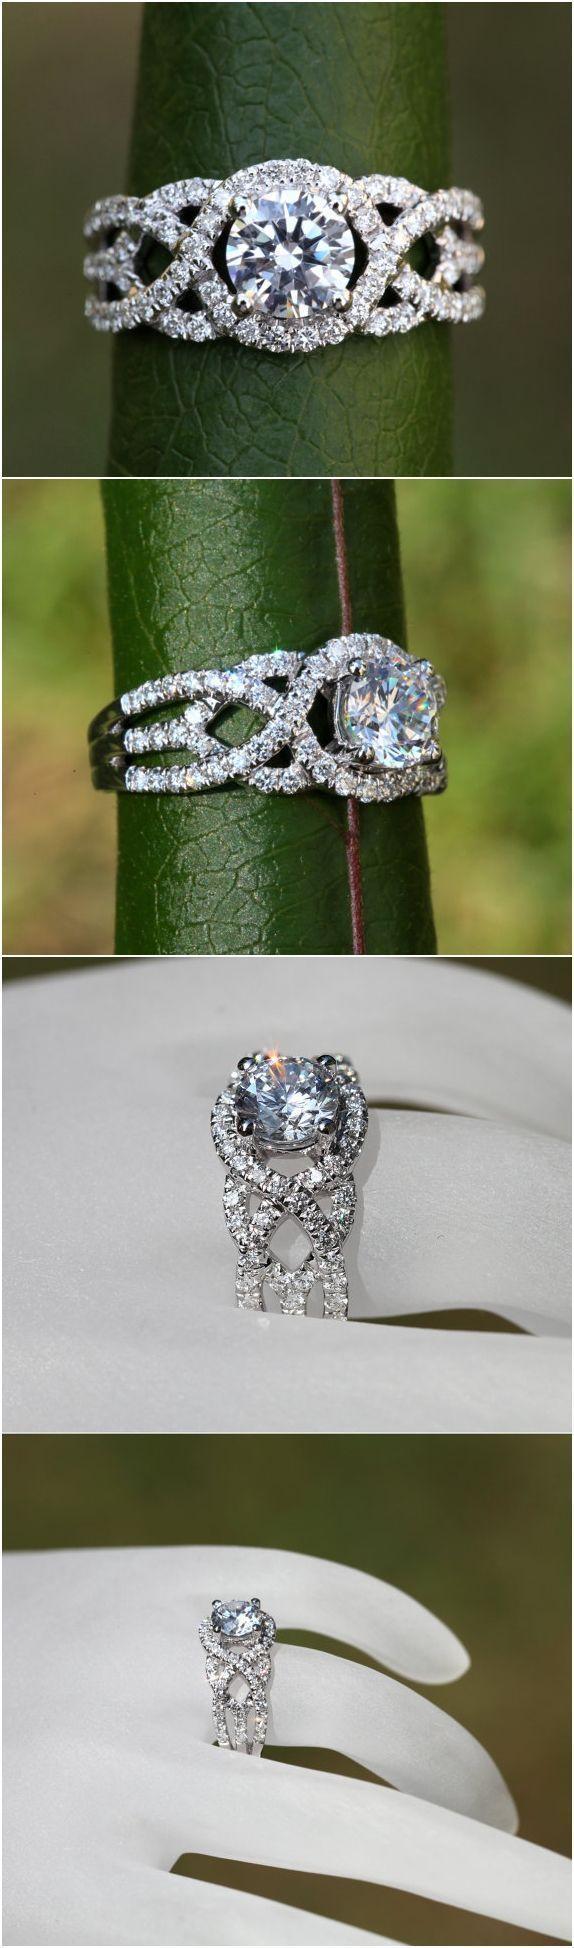 best bling images on pinterest promise rings wedding bands